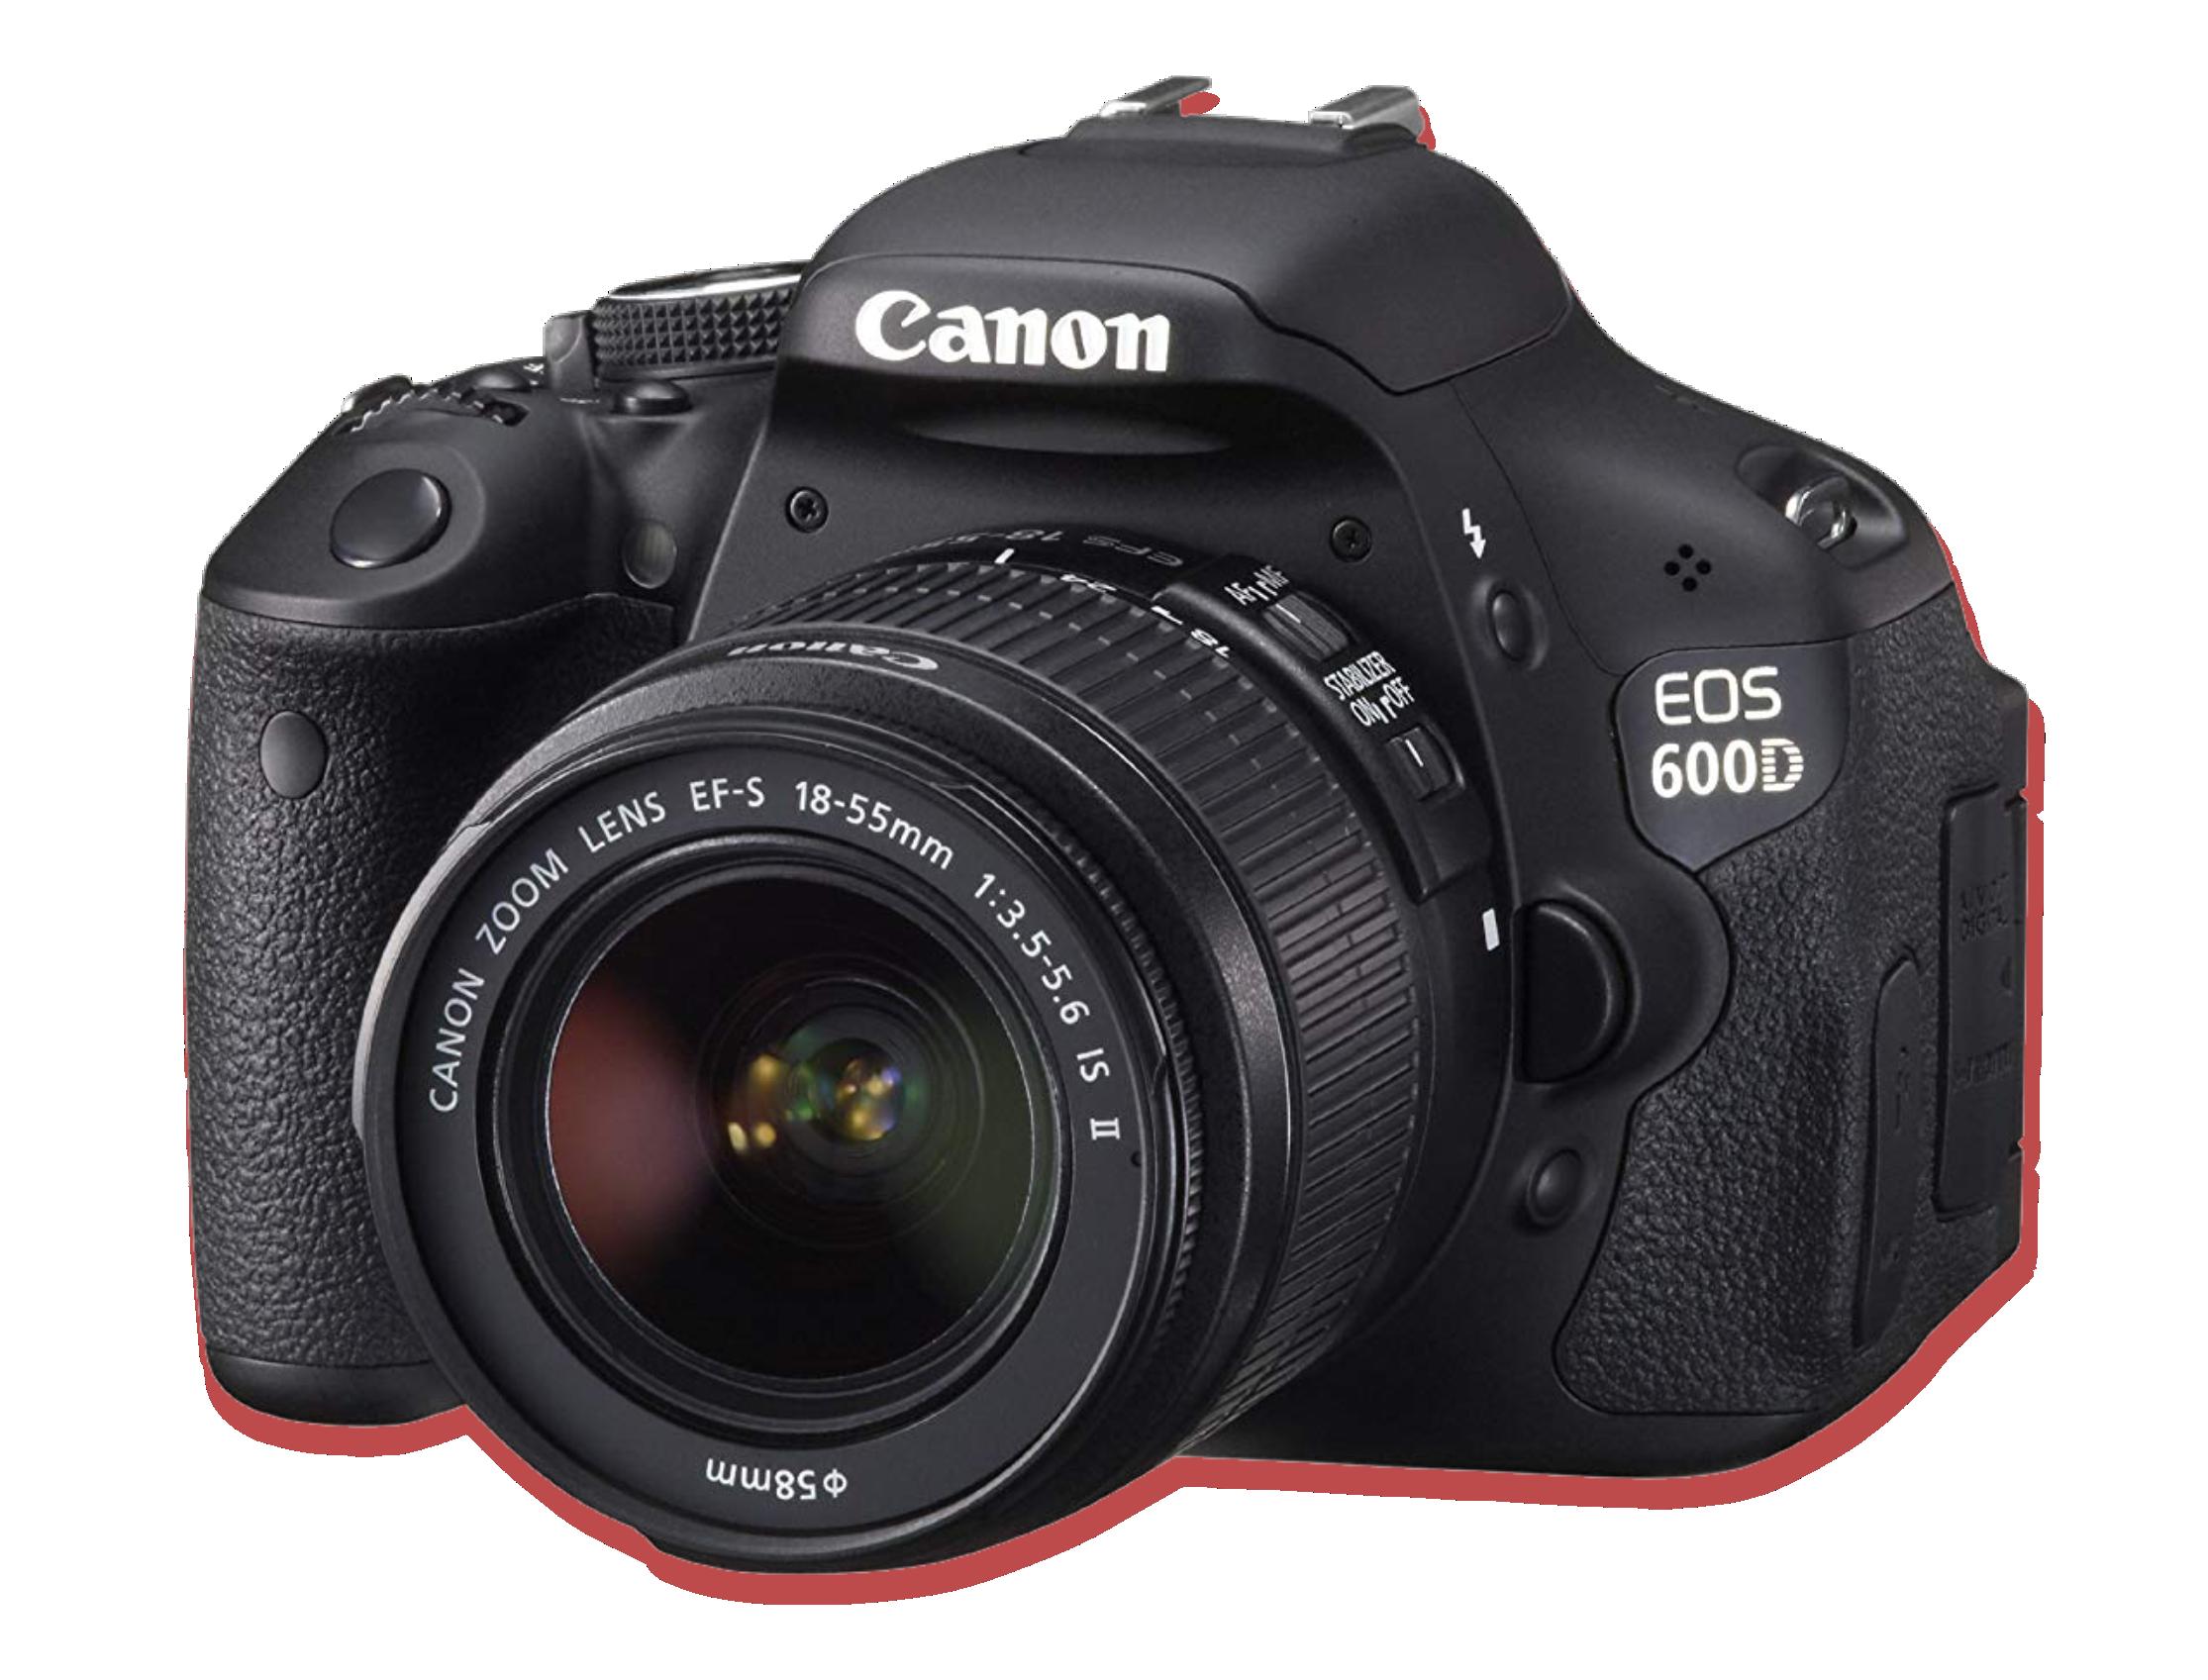 Sewa kamera Canon 600D